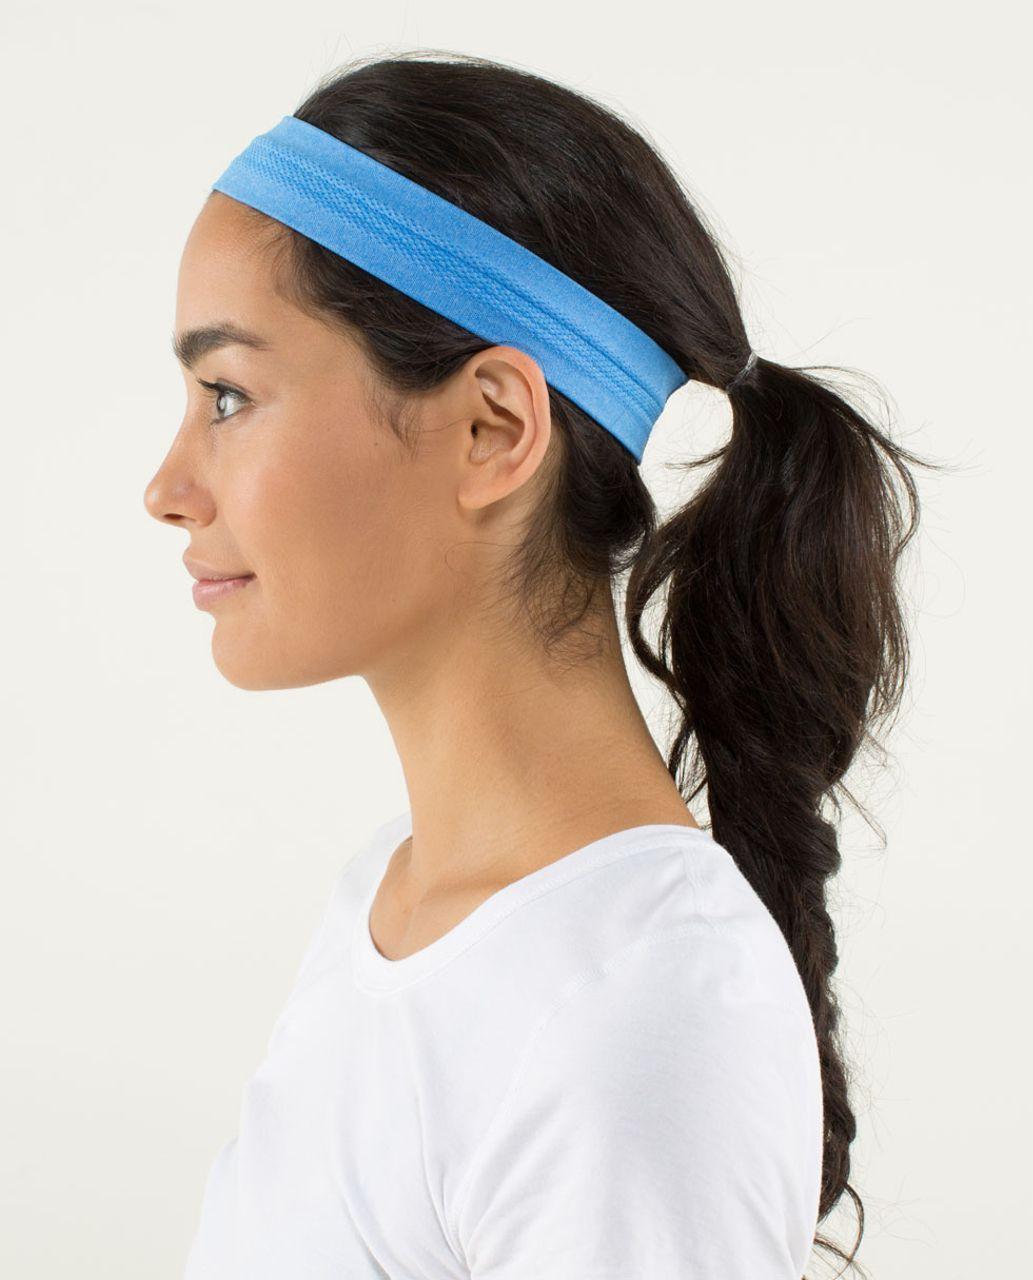 Lululemon Swiftly Headband - Heathered Cornflower